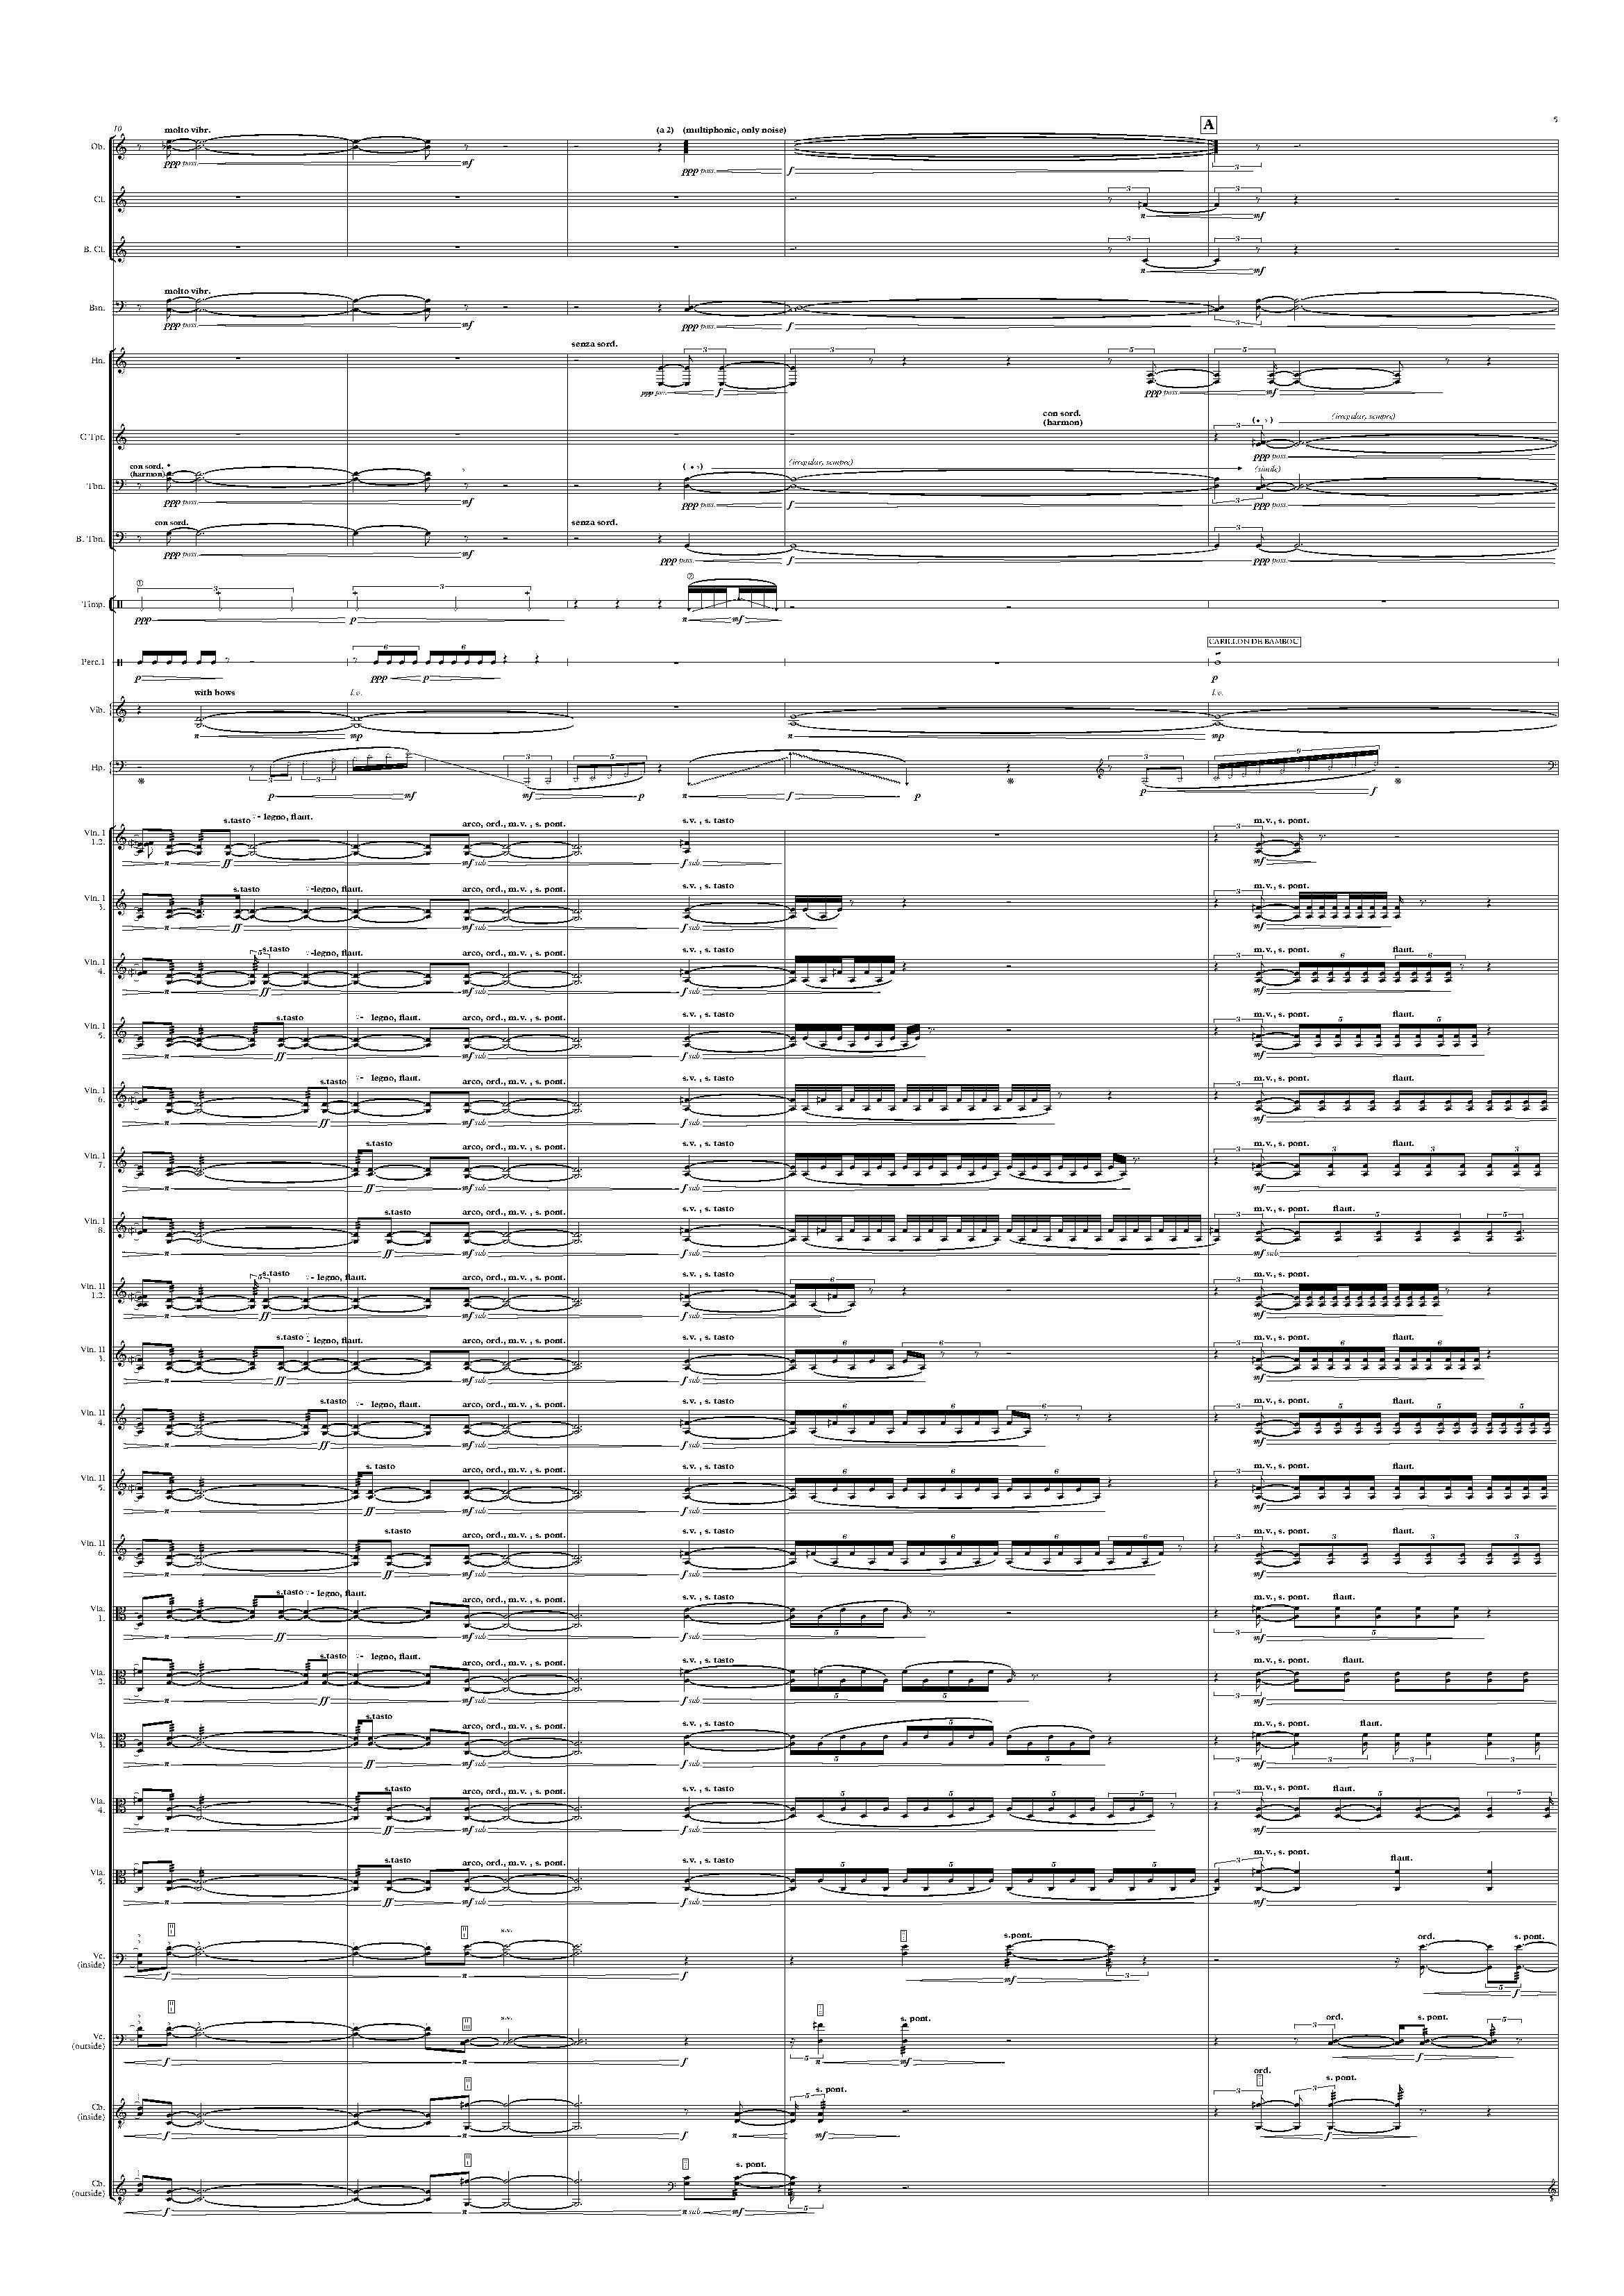 Plage des amours -Sérgio Rodrigo - Full Score_Seite_05.jpg